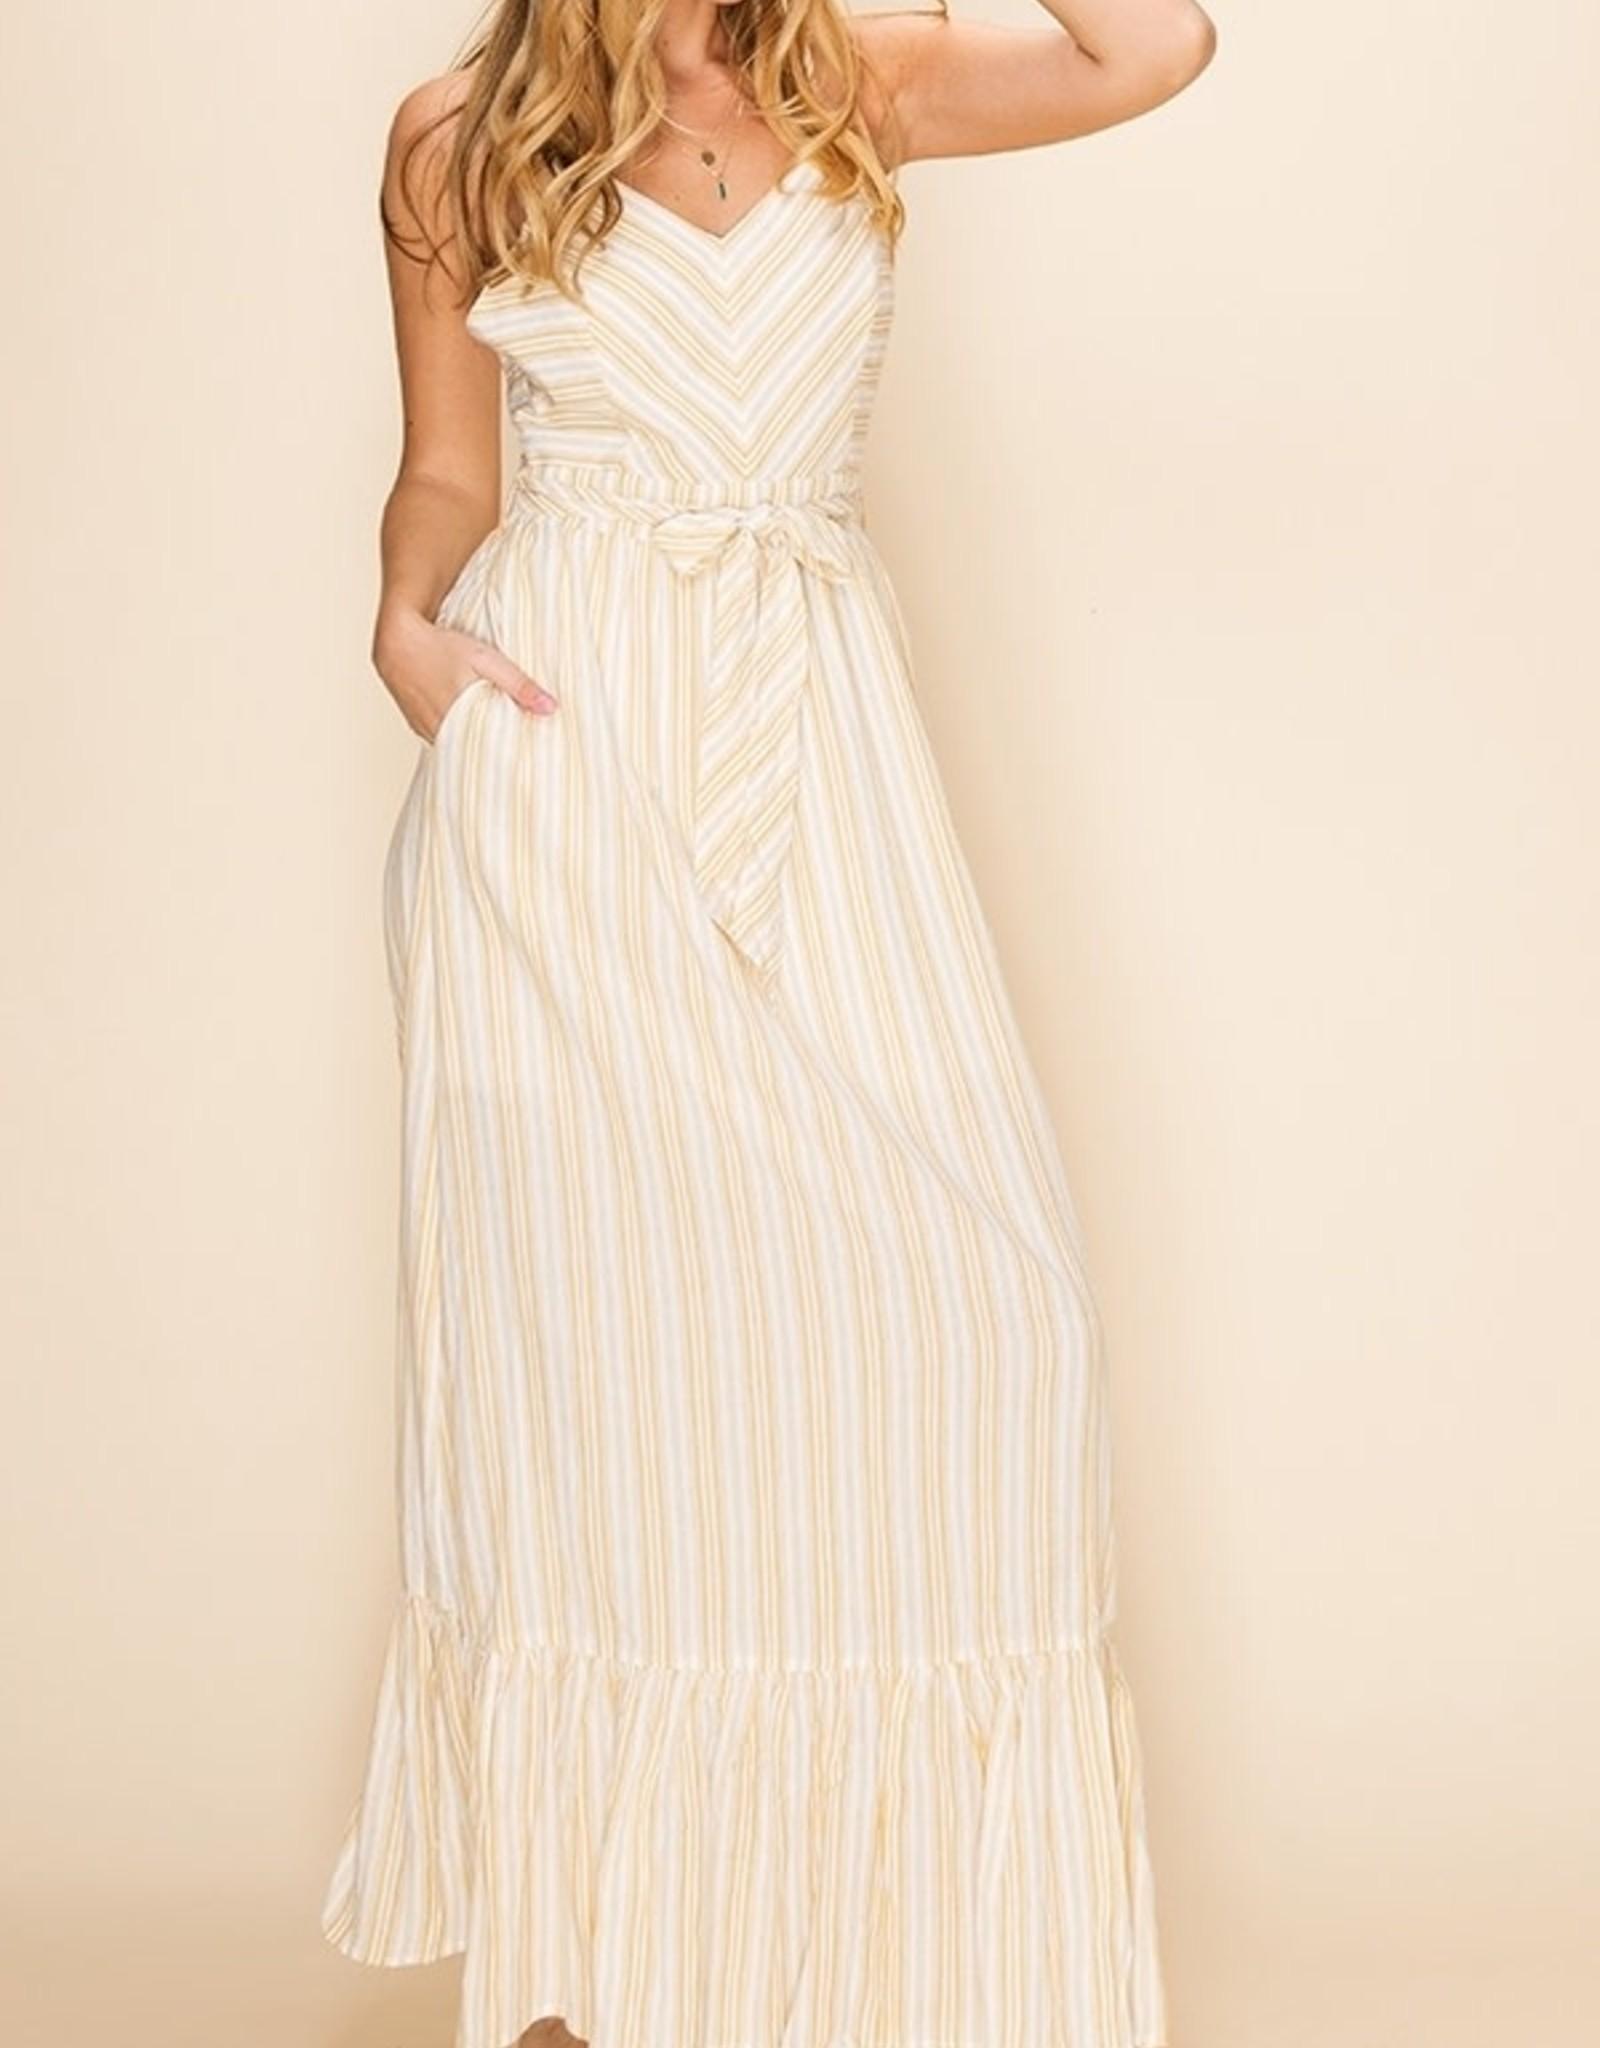 HYFVE Striped Maxi Dress